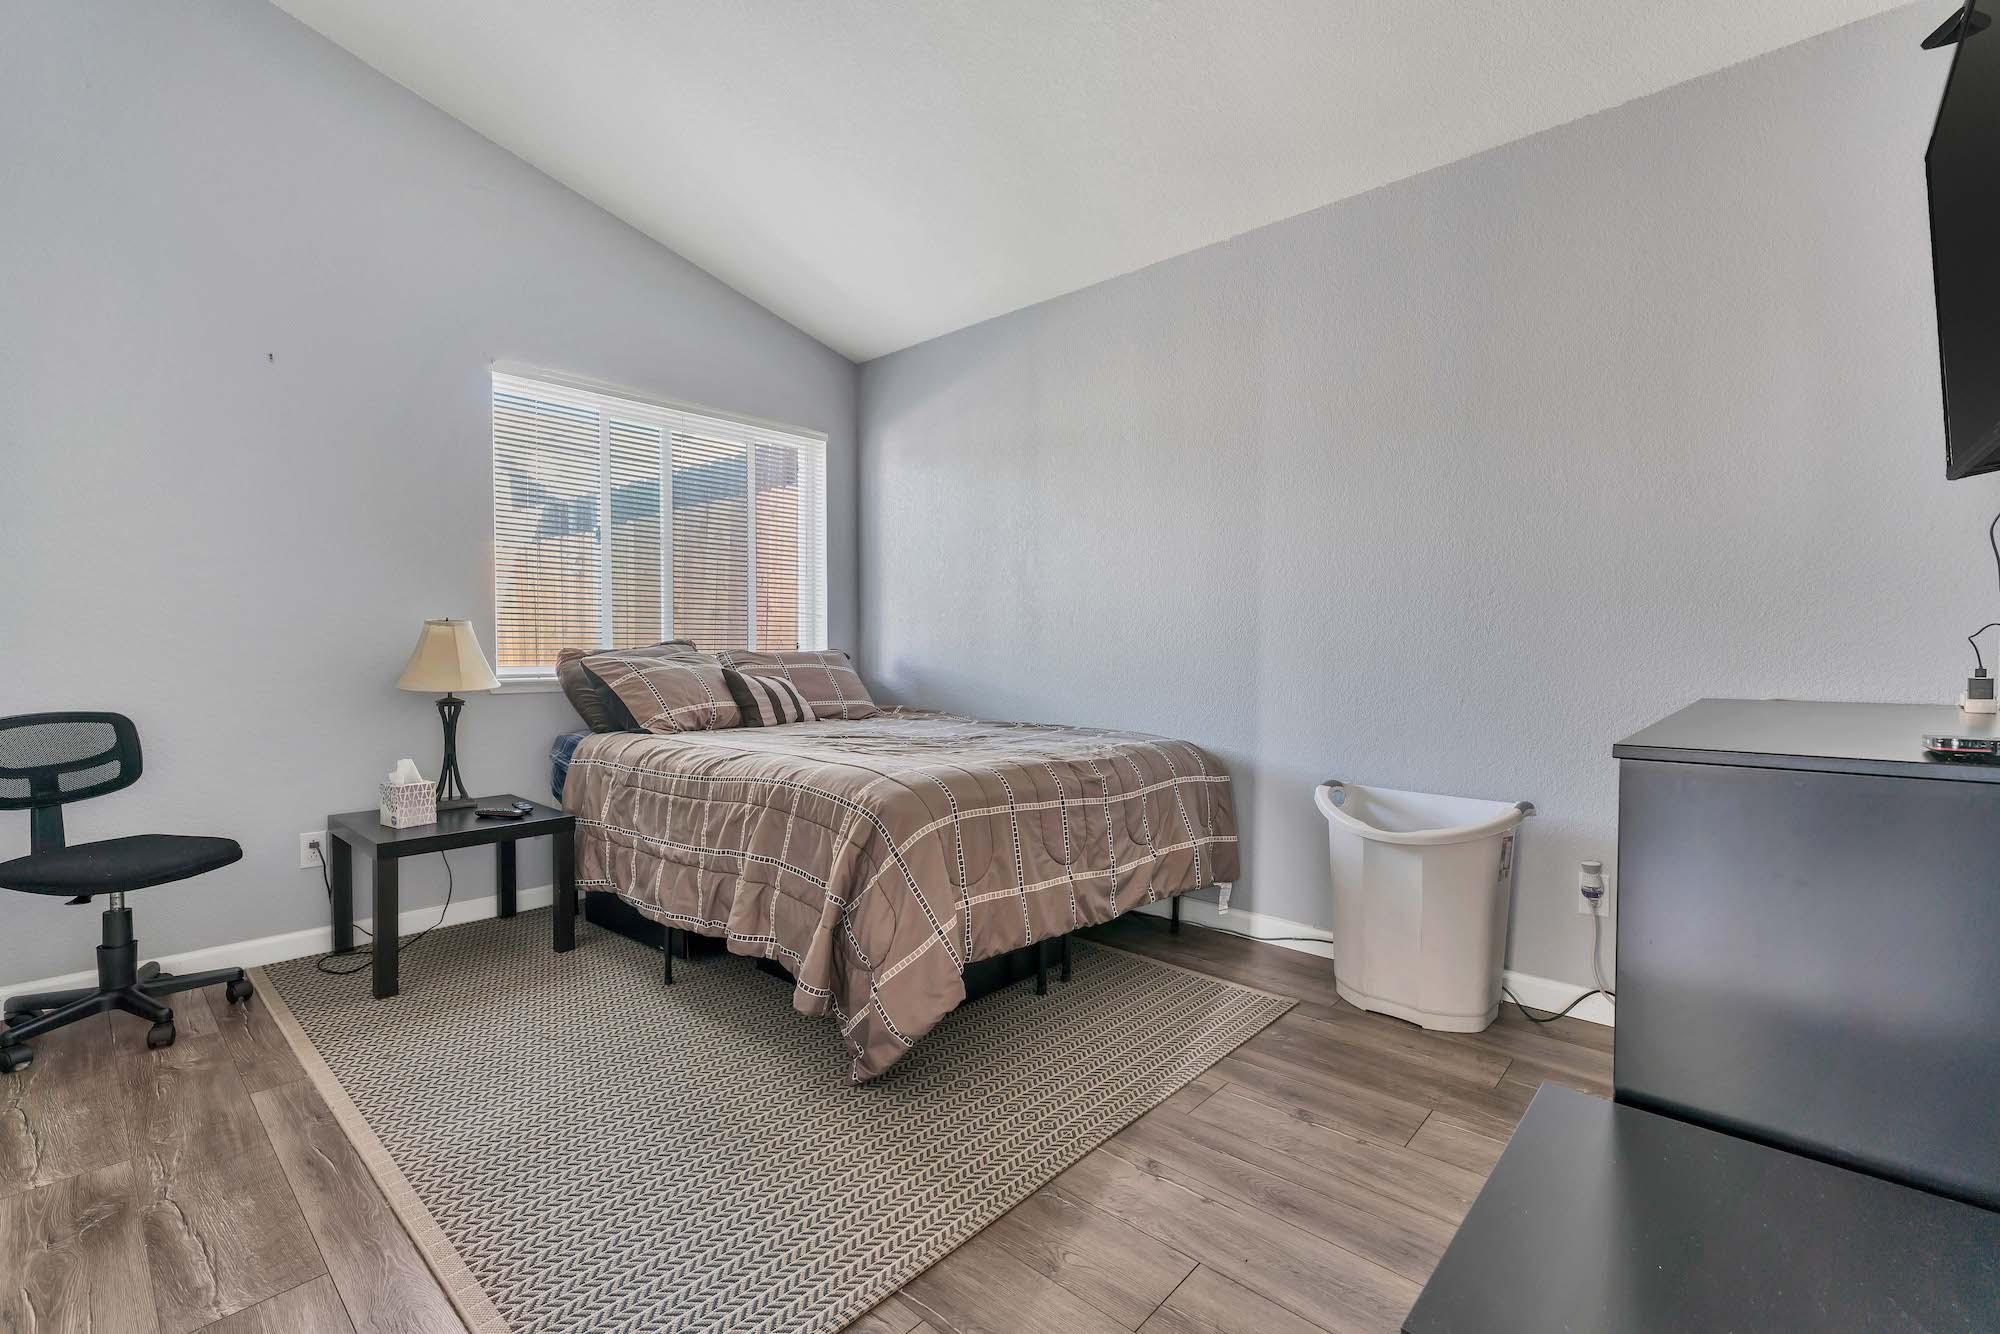 Second bedroom of home 7121 Heather Tree Dr, Sacramento Ca